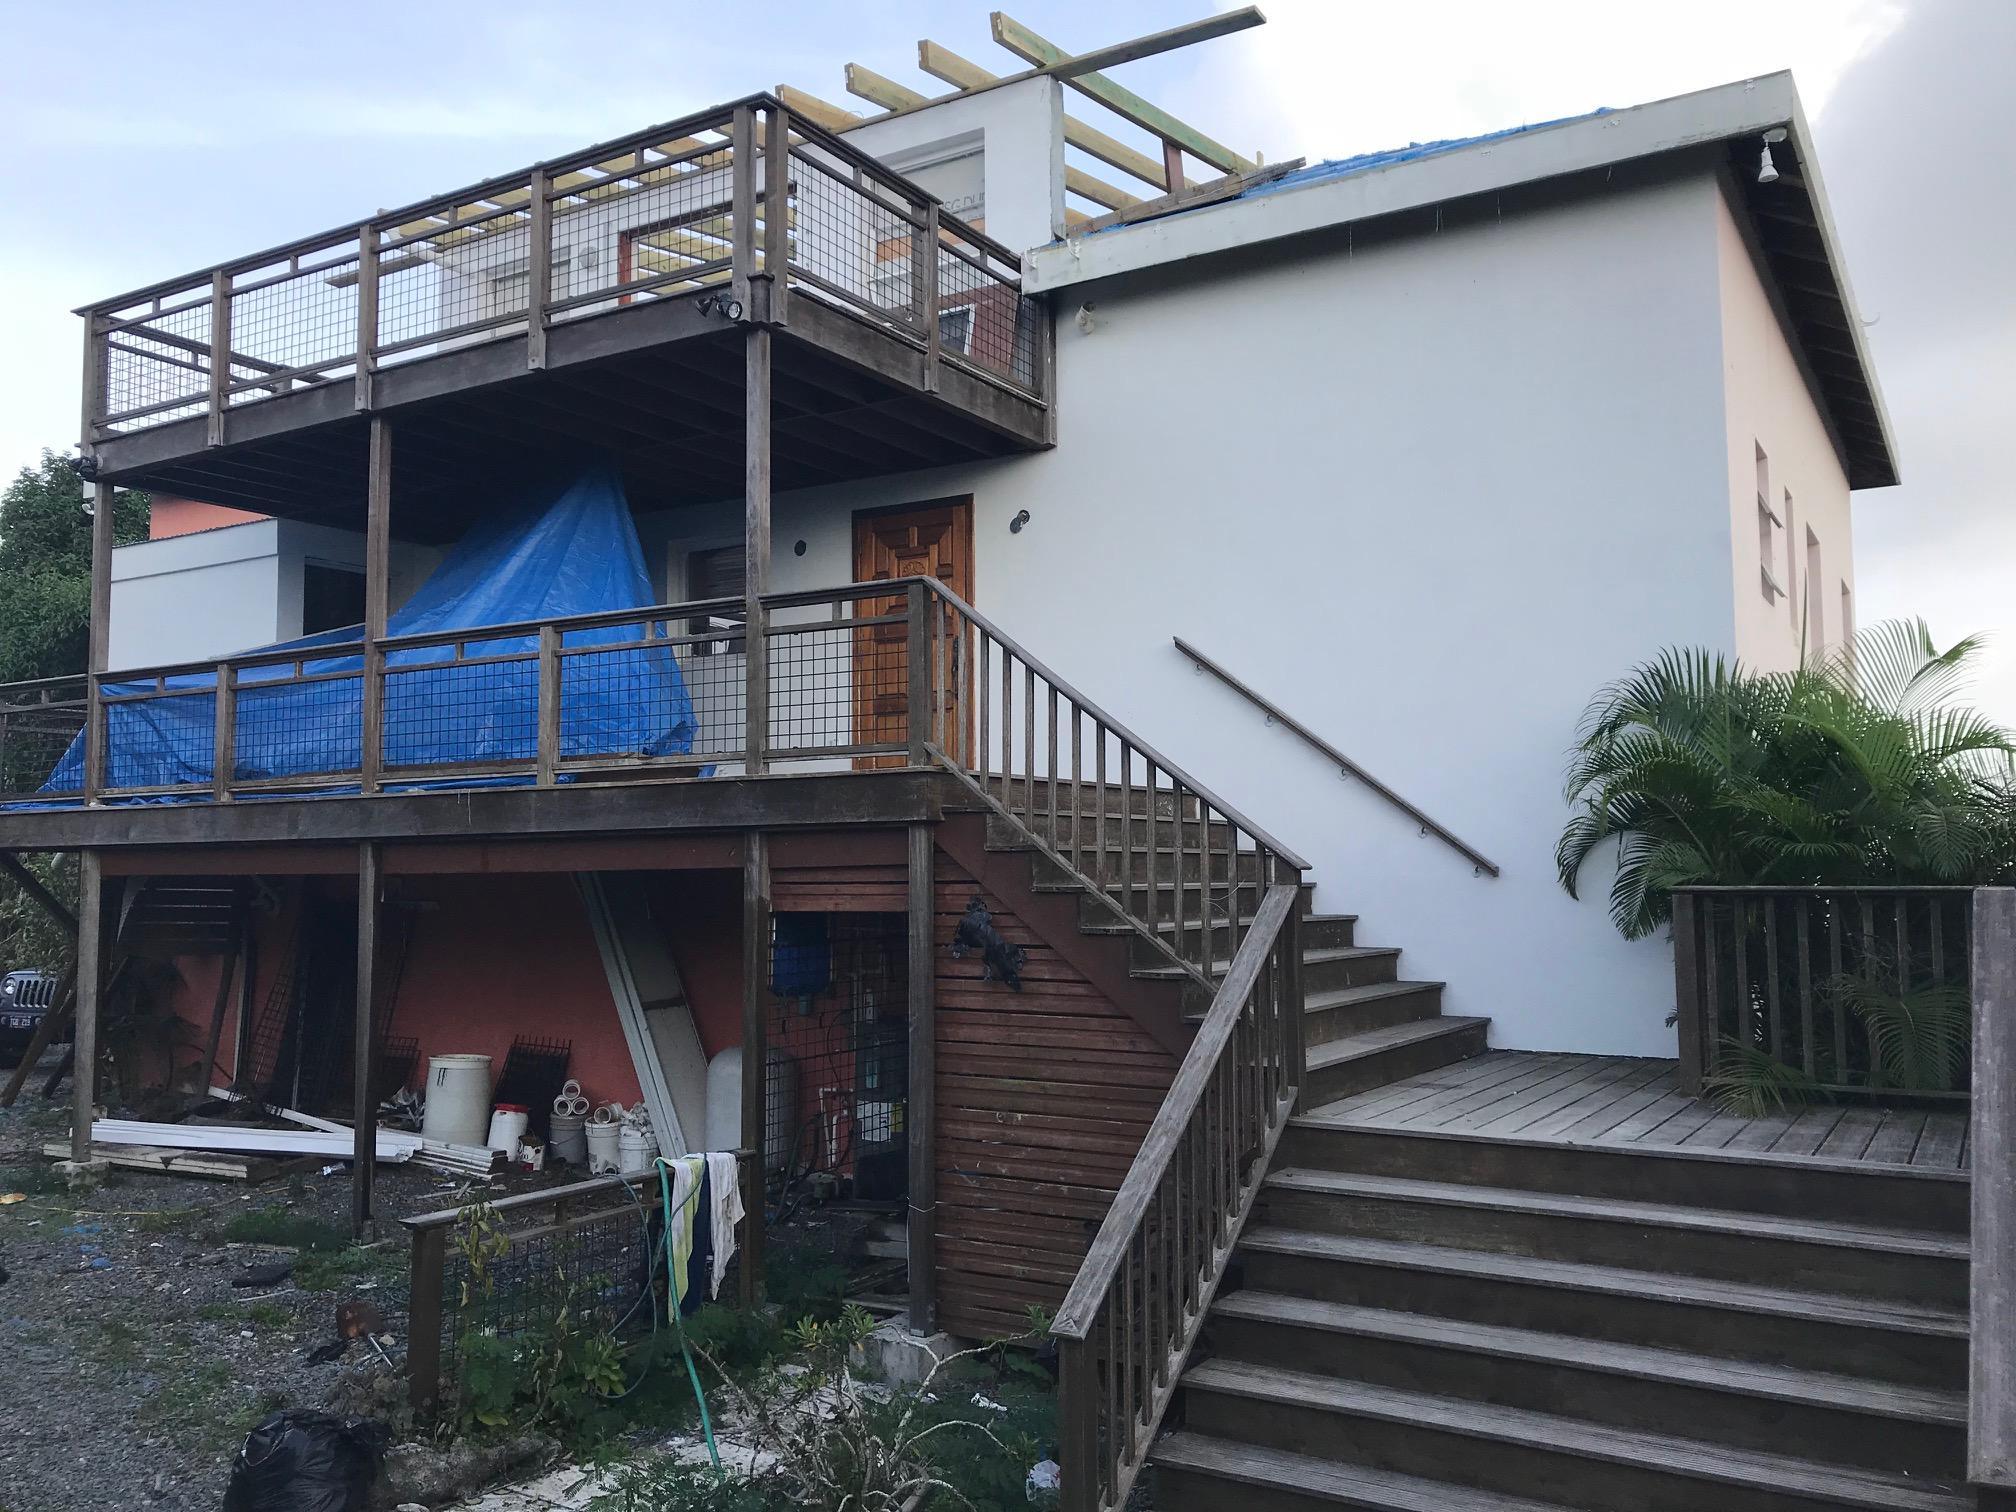 006 Roof progress